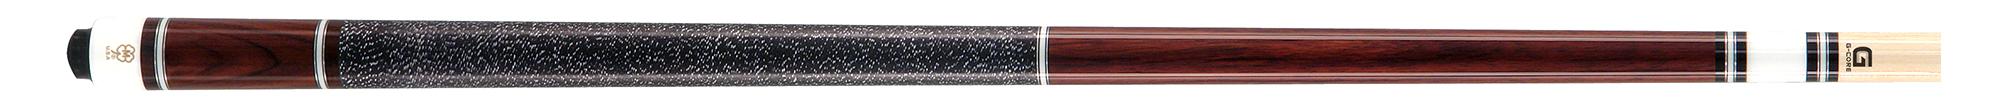 PK3013: McDermott G222 Rosewood pool Gewicht: 19Oz #1